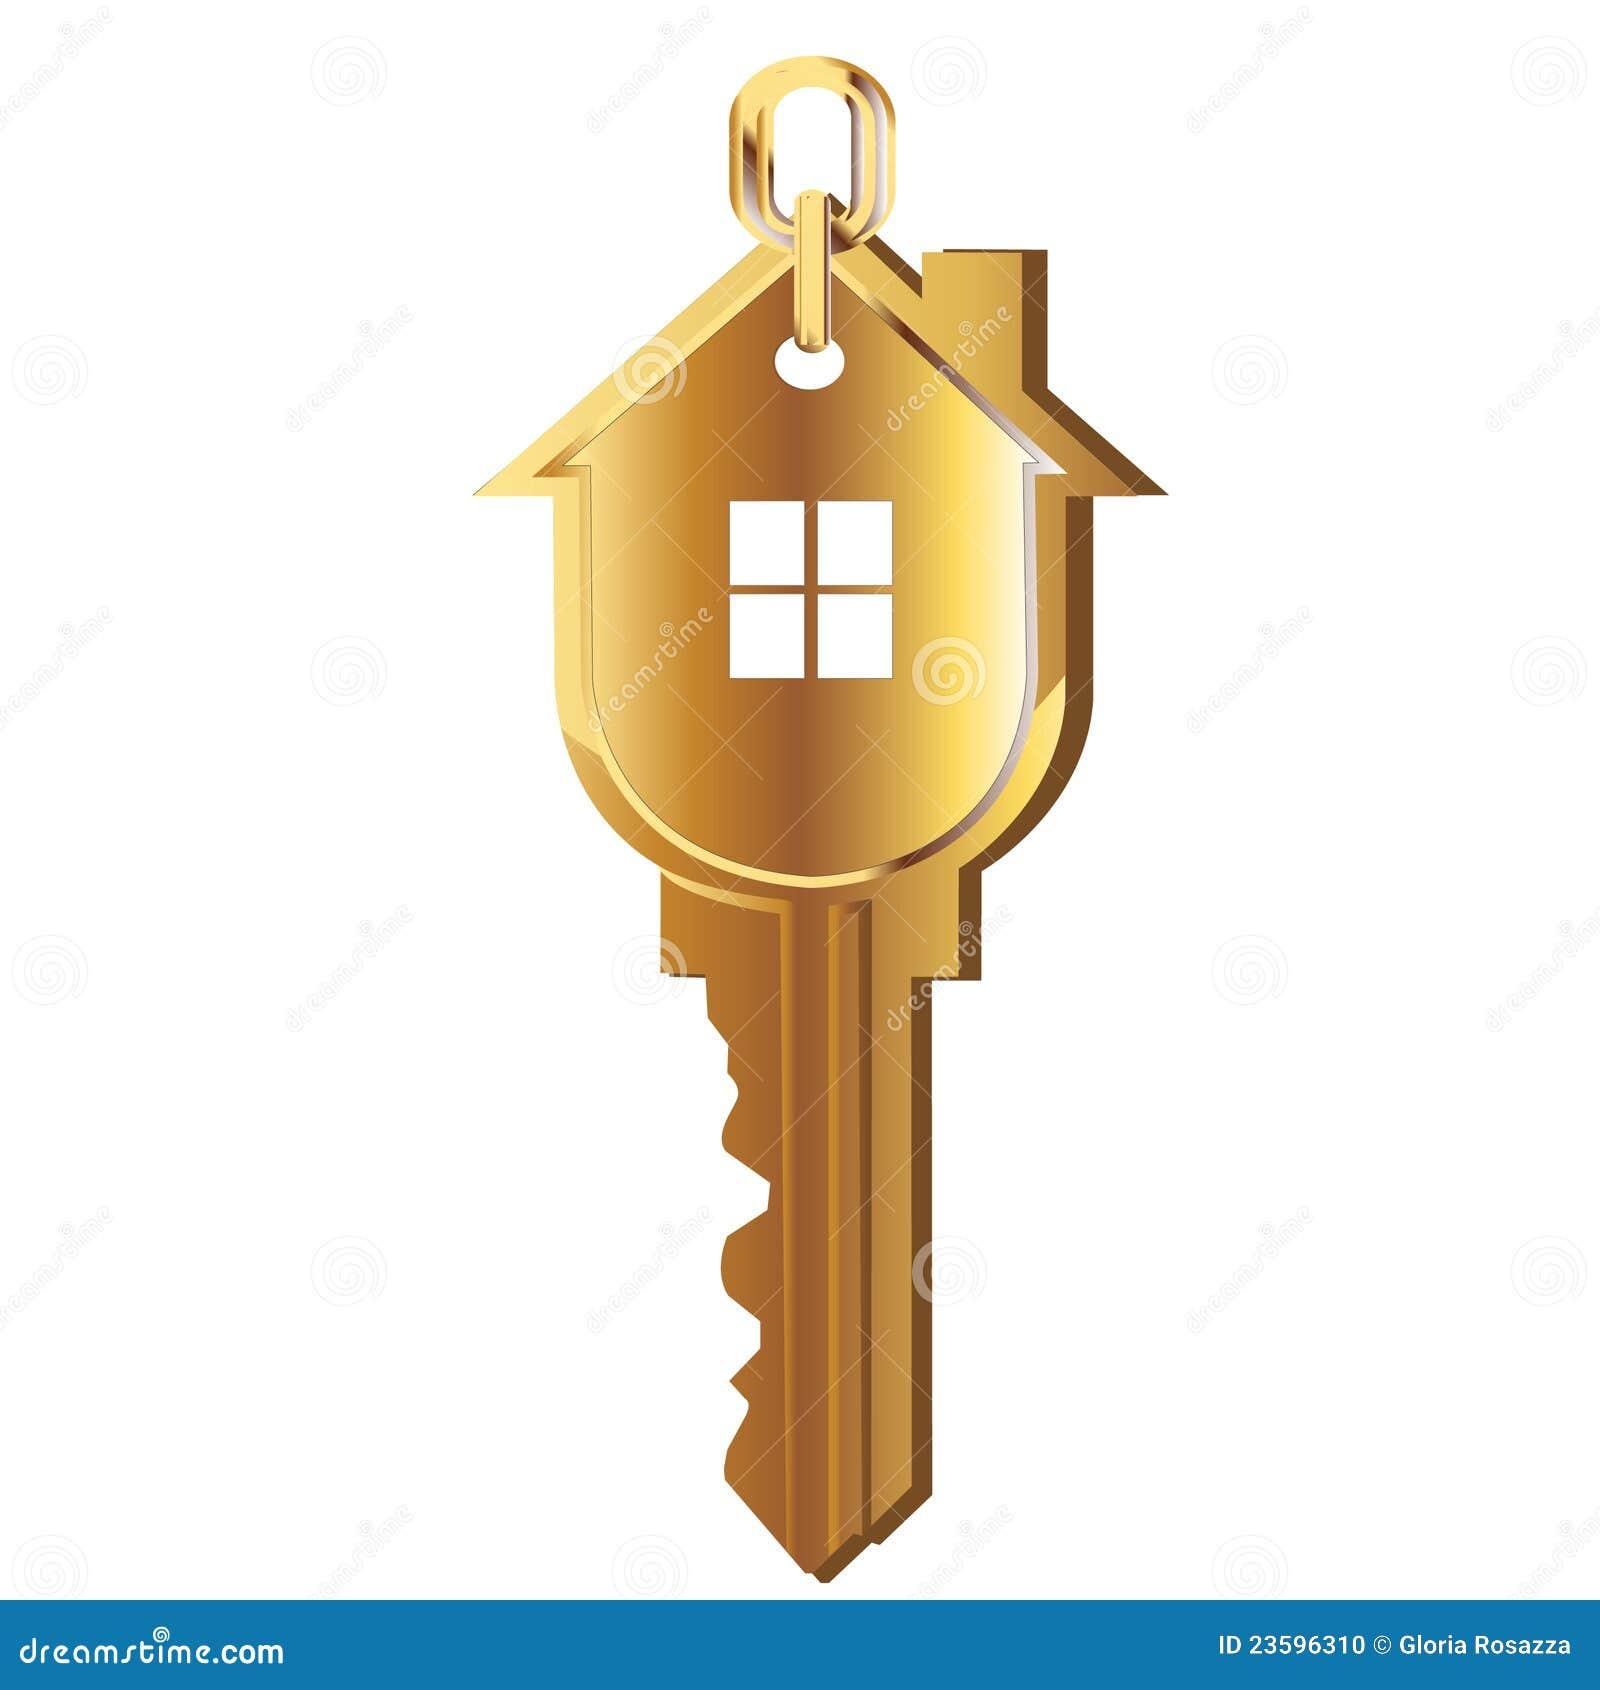 Home Design 3d Gold: House Key Gold Logo Stock Photo